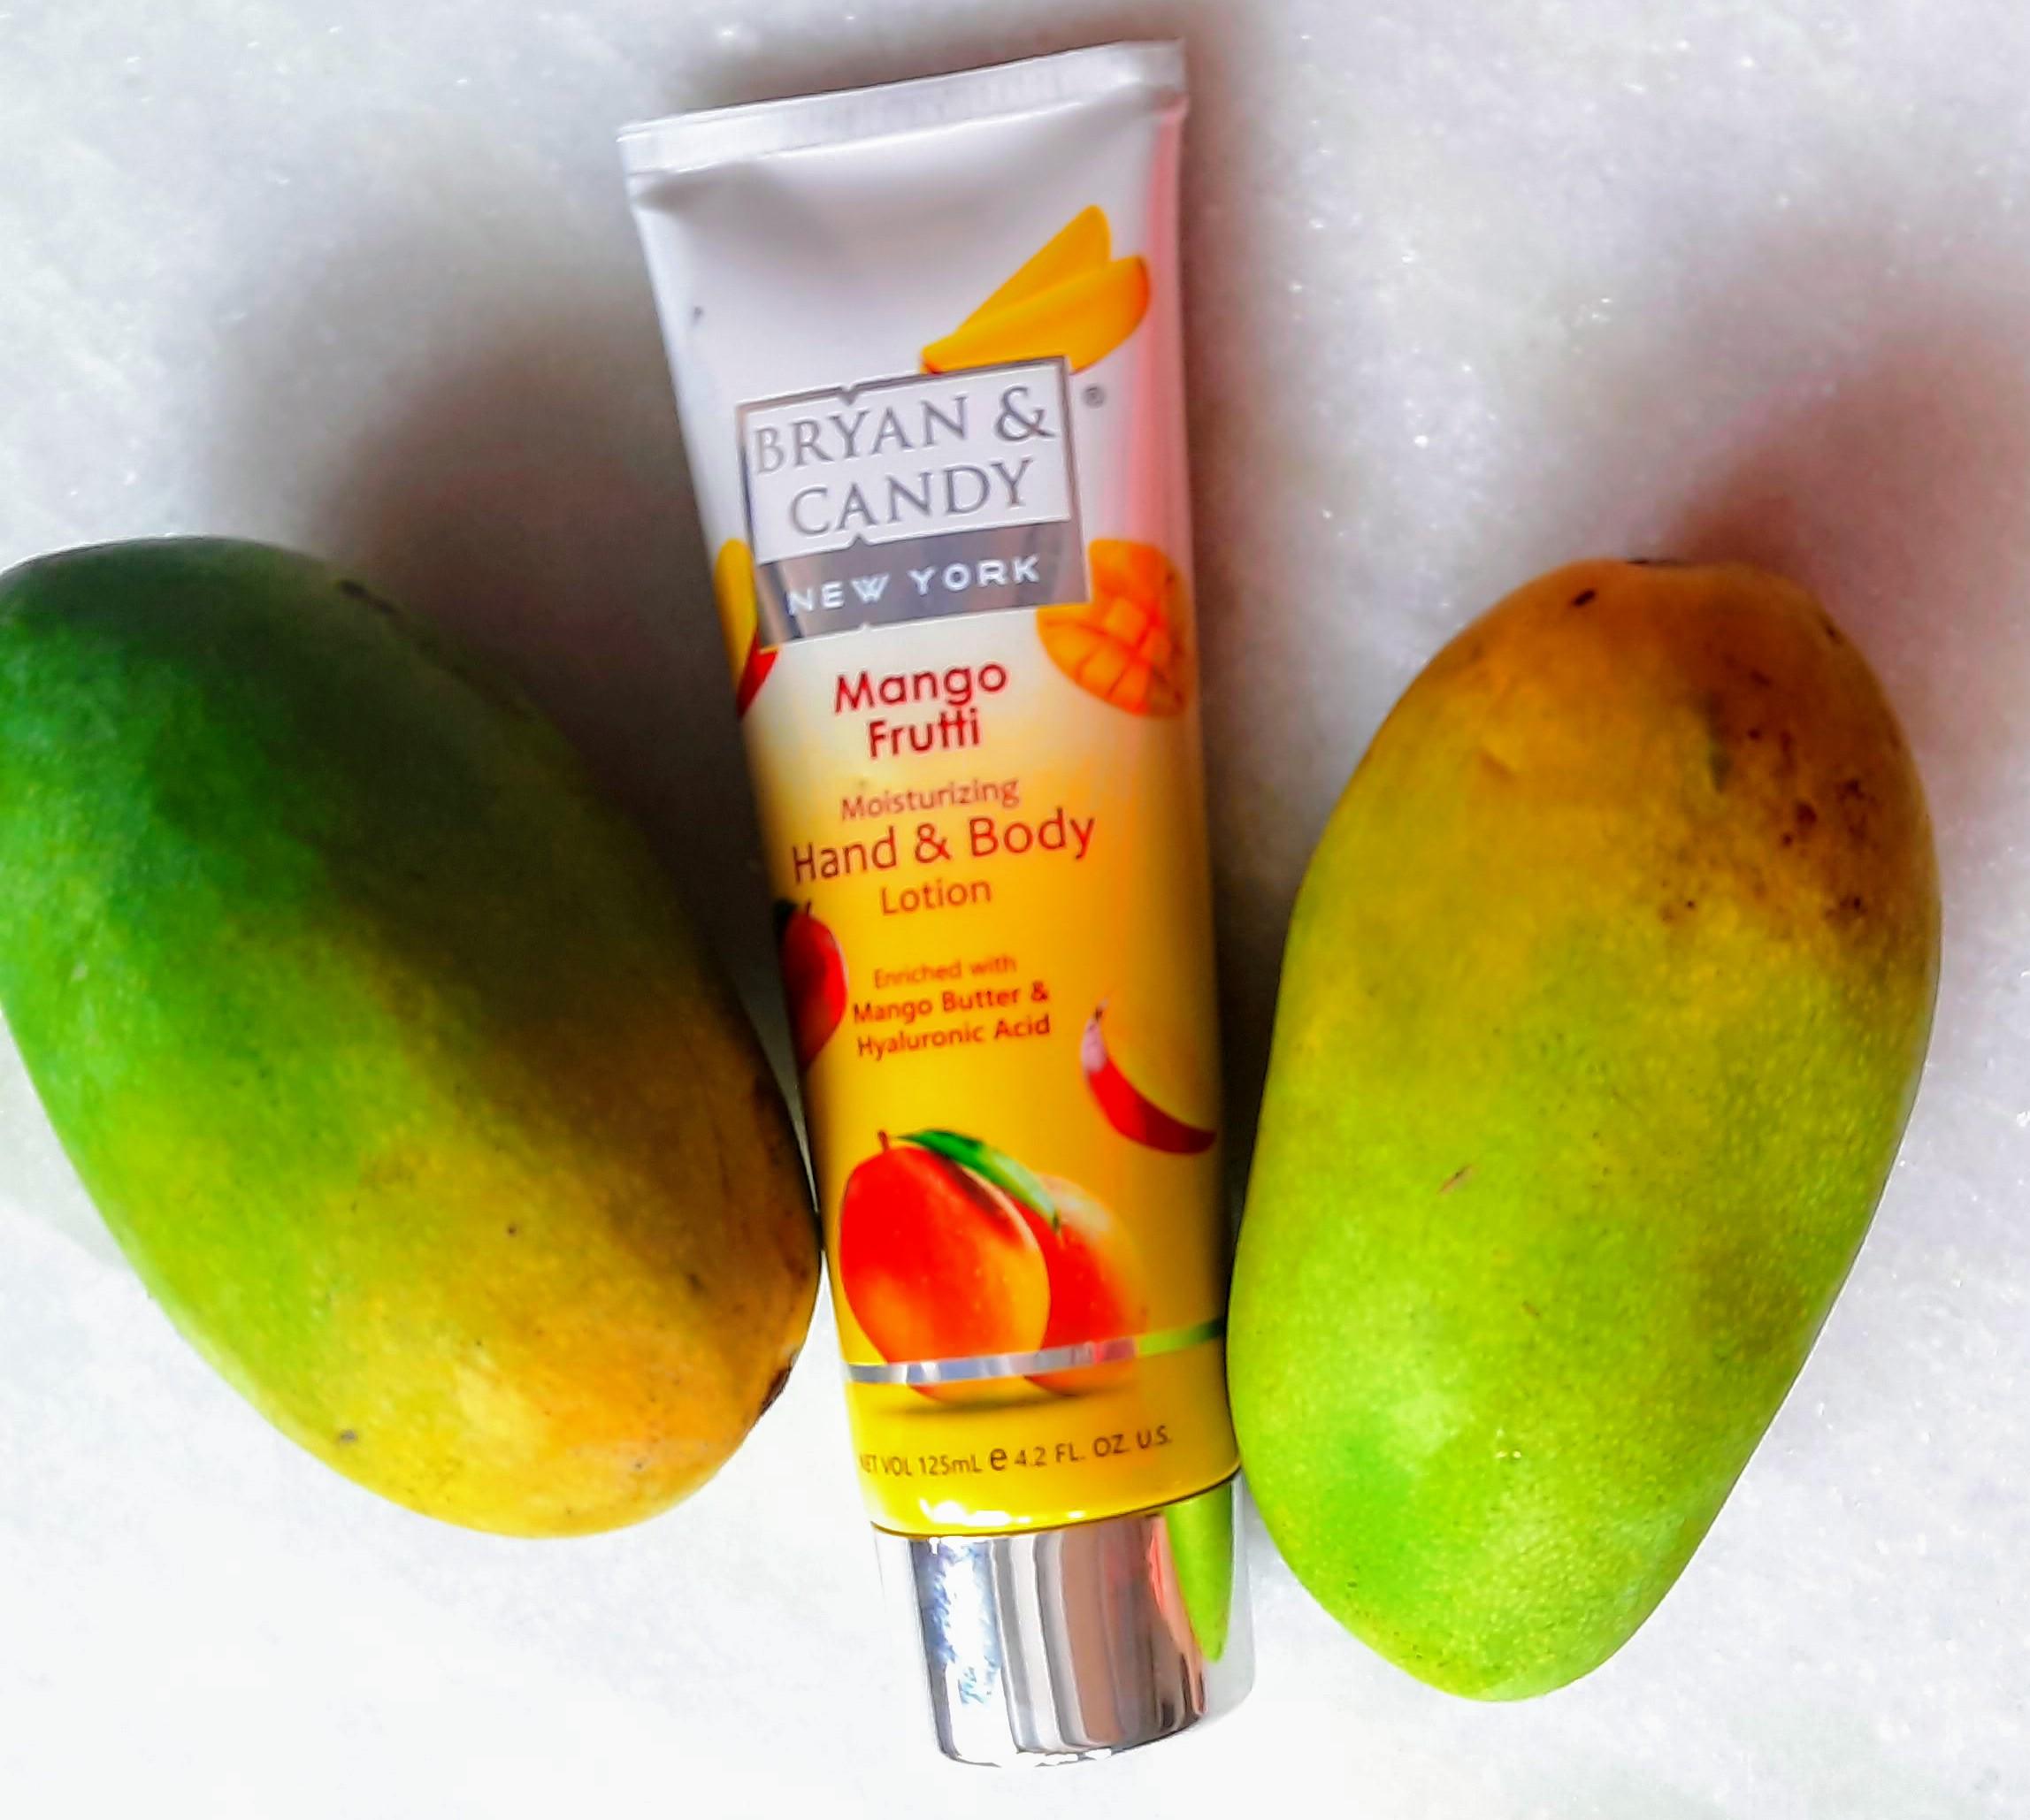 Bryan & Candy New York Mango Frutti Hand and Body Lotion -Amazingly sweet product-By pooja_jain2